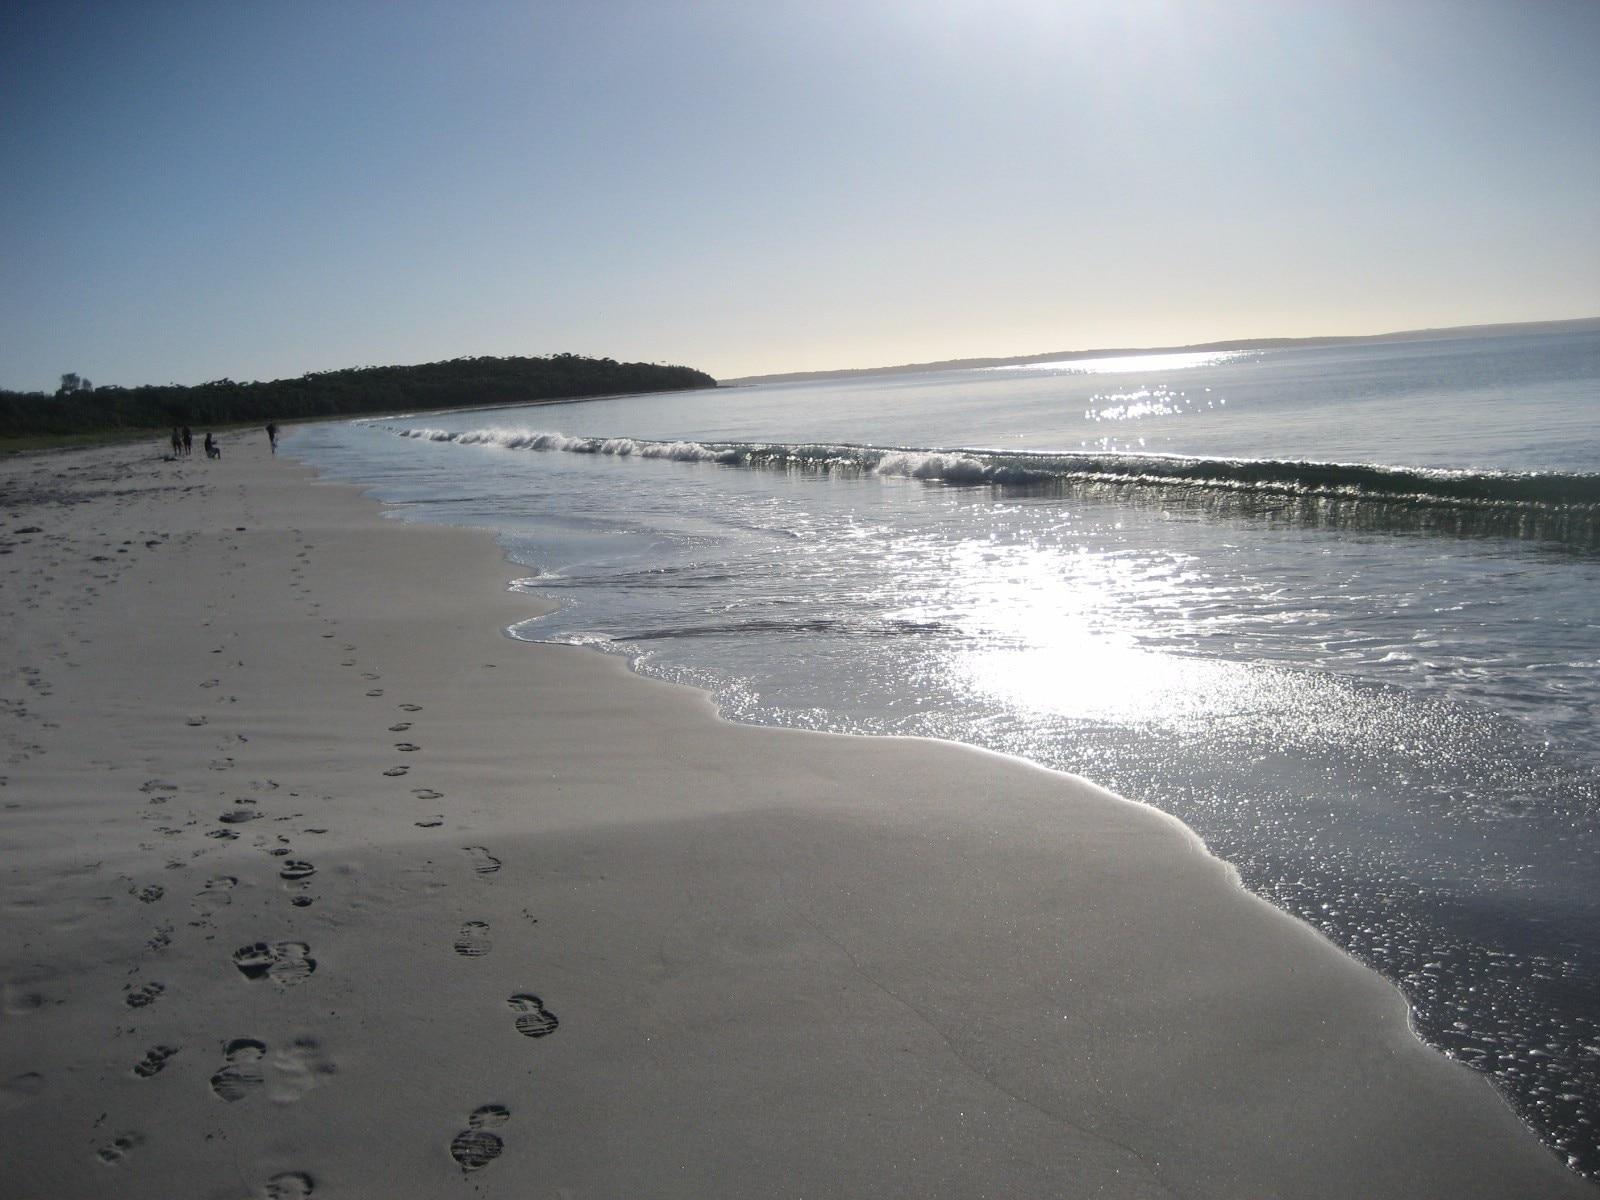 Callala Beach, New South Wales, Australia